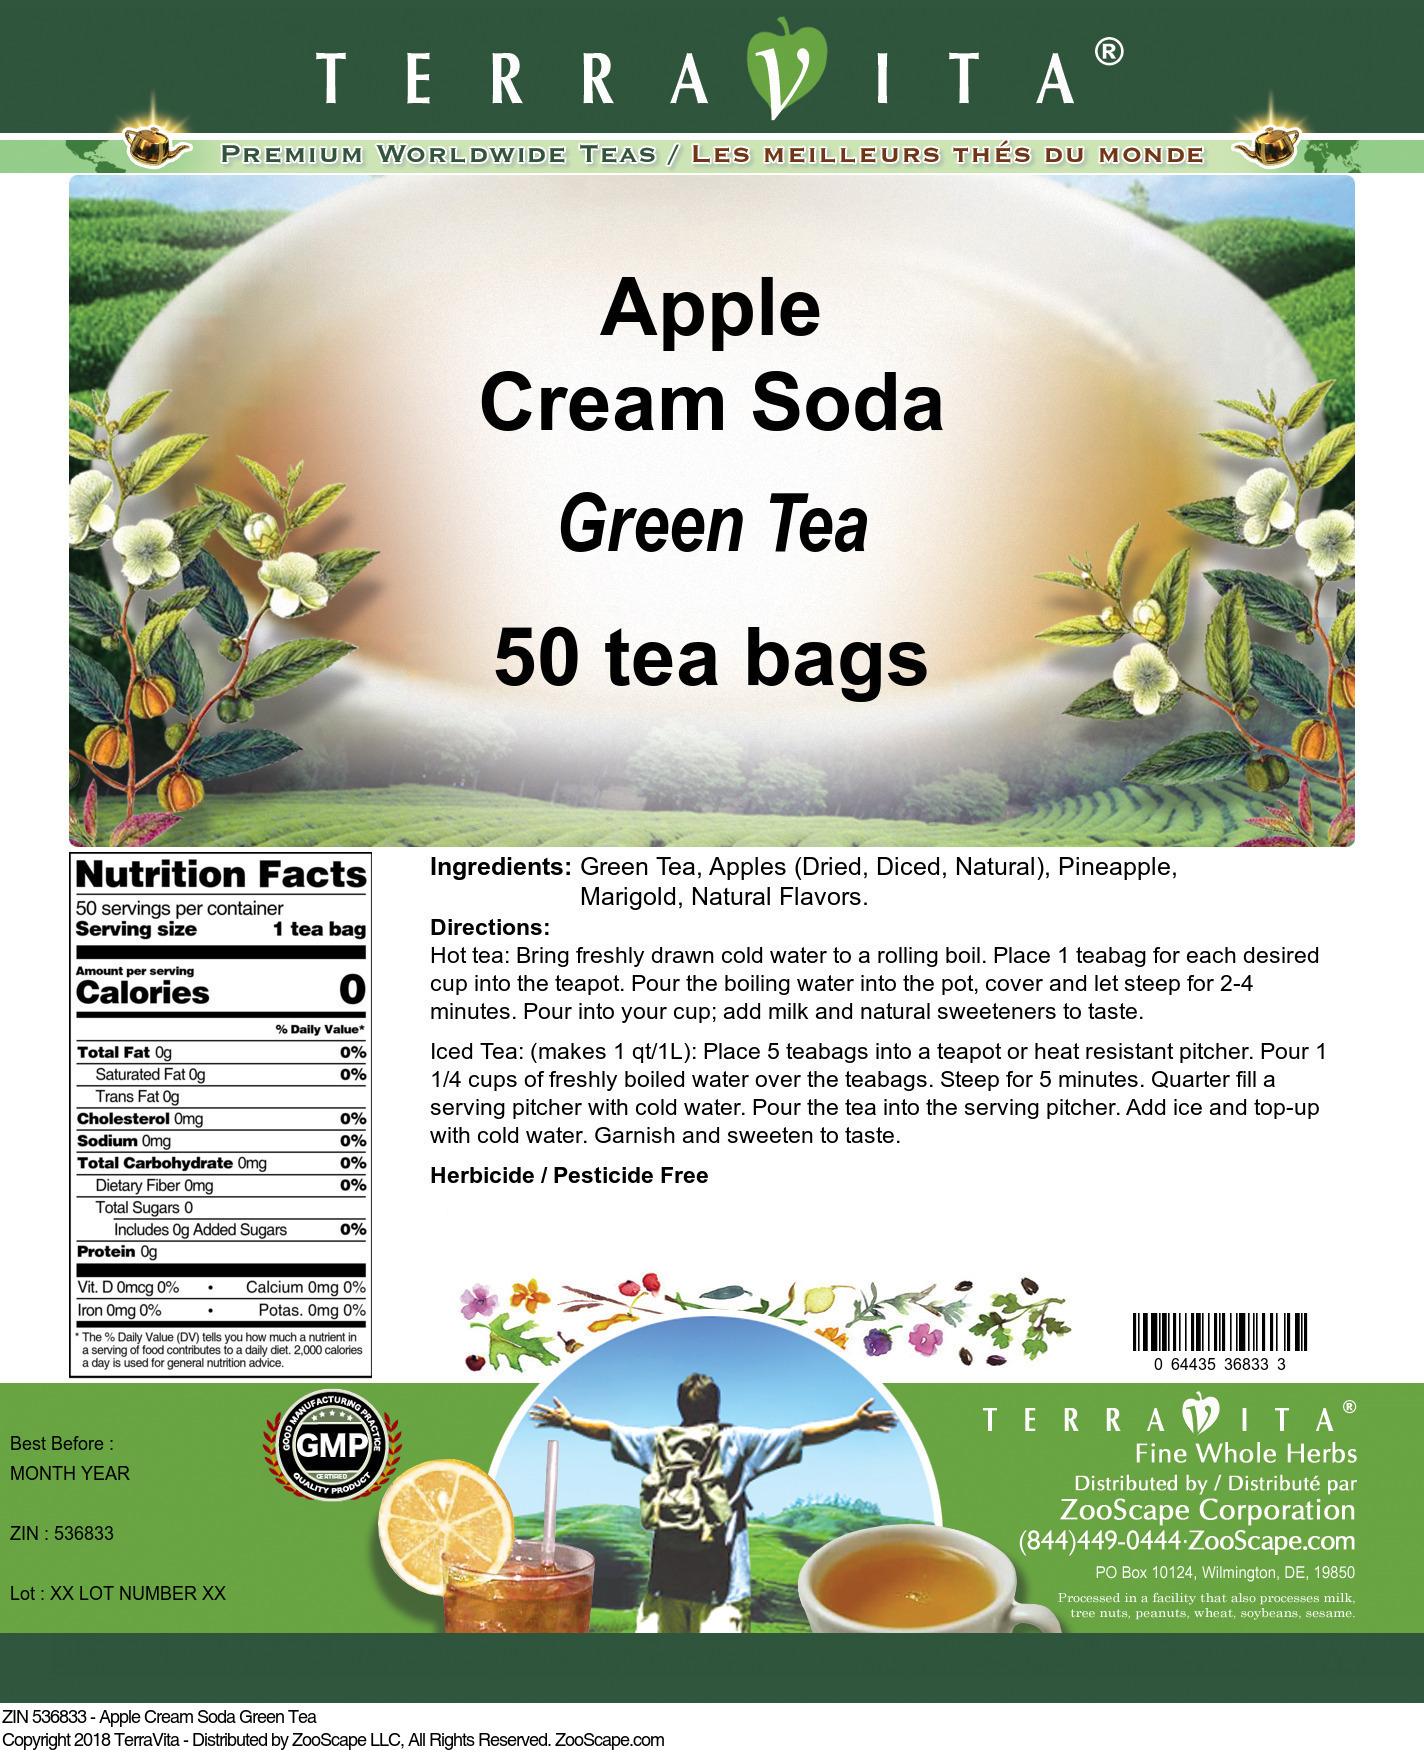 Apple Cream Soda Green Tea